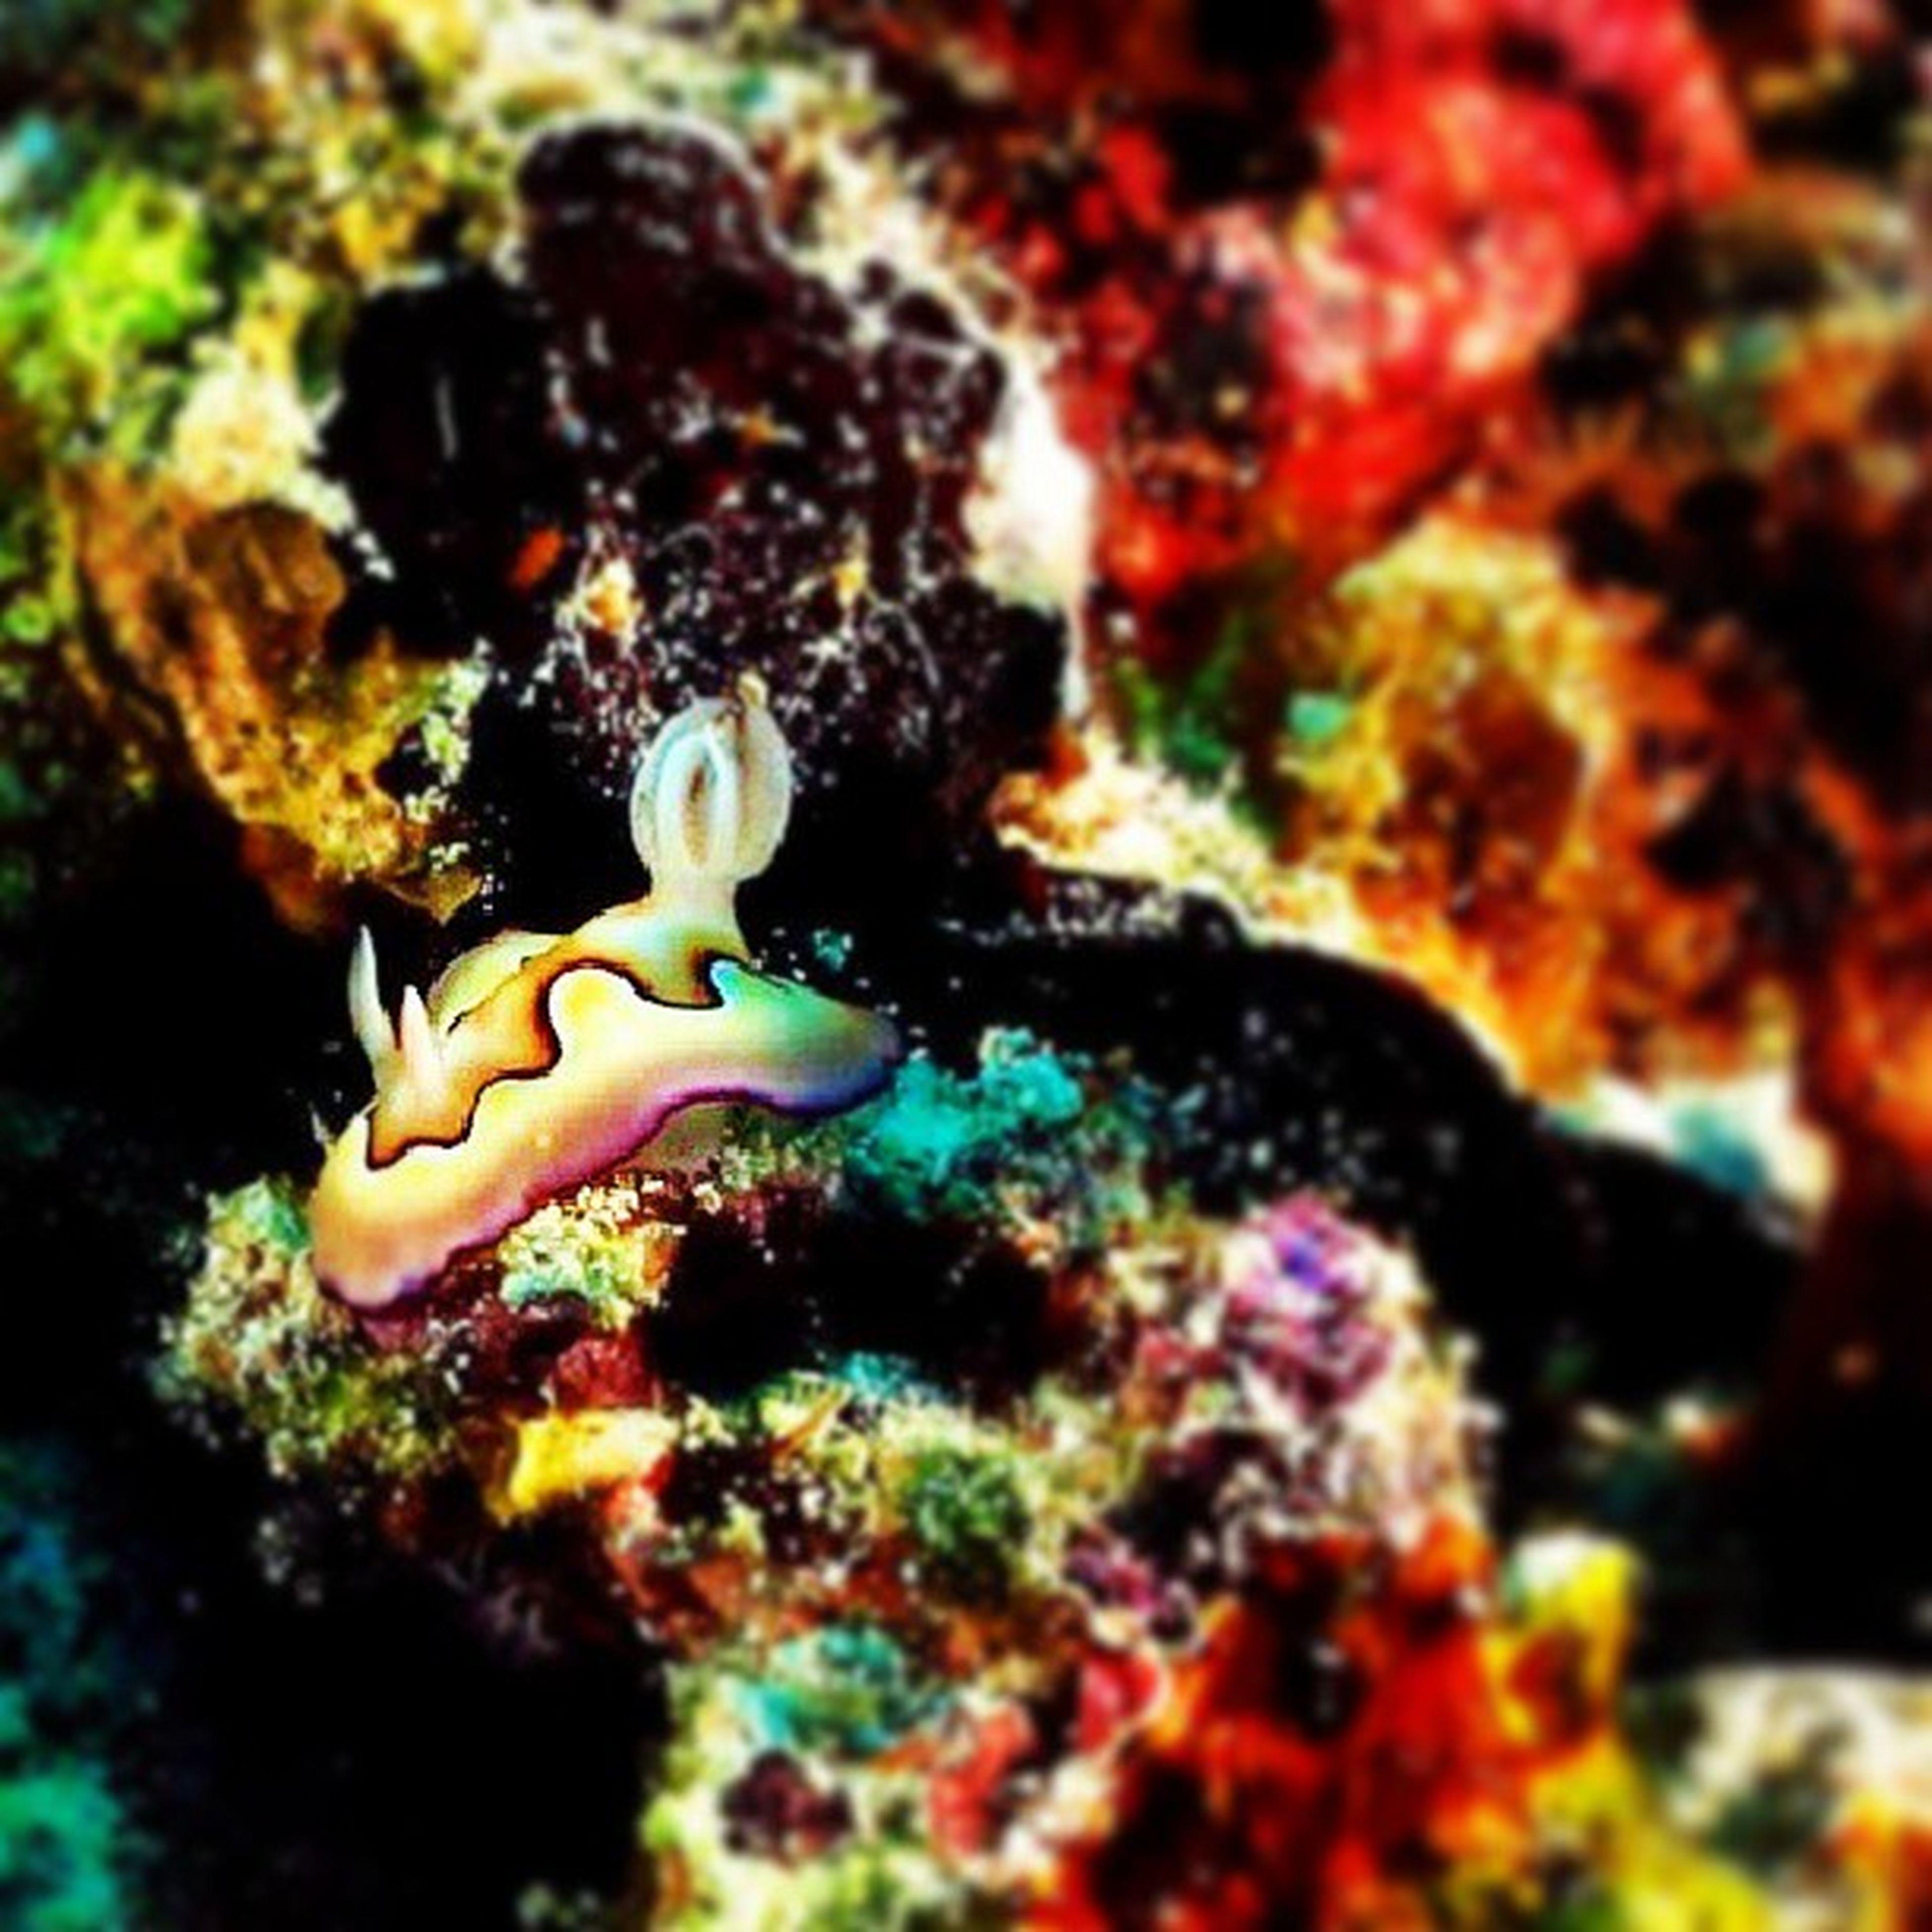 underwater, sea life, undersea, fish, animal themes, swimming, animals in the wild, coral, wildlife, close-up, aquarium, water, sea, indoors, one animal, rock - object, nature, multi colored, aquatic, selective focus